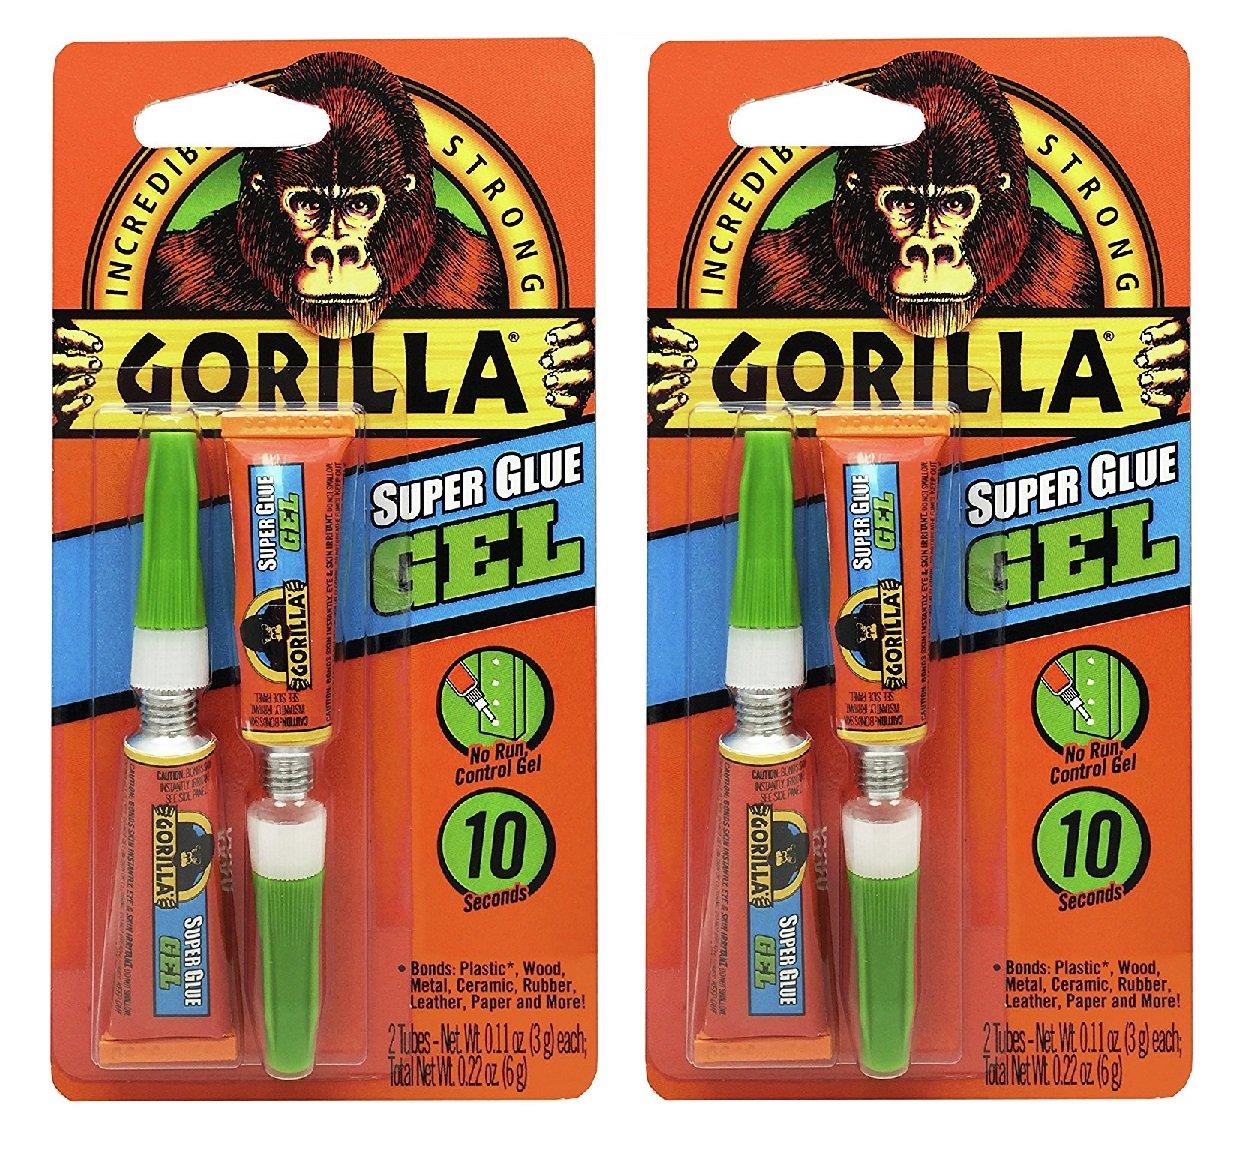 Gorilla Super Glue Gel, 6 g, Clear, (Pack of 2) by Gorilla